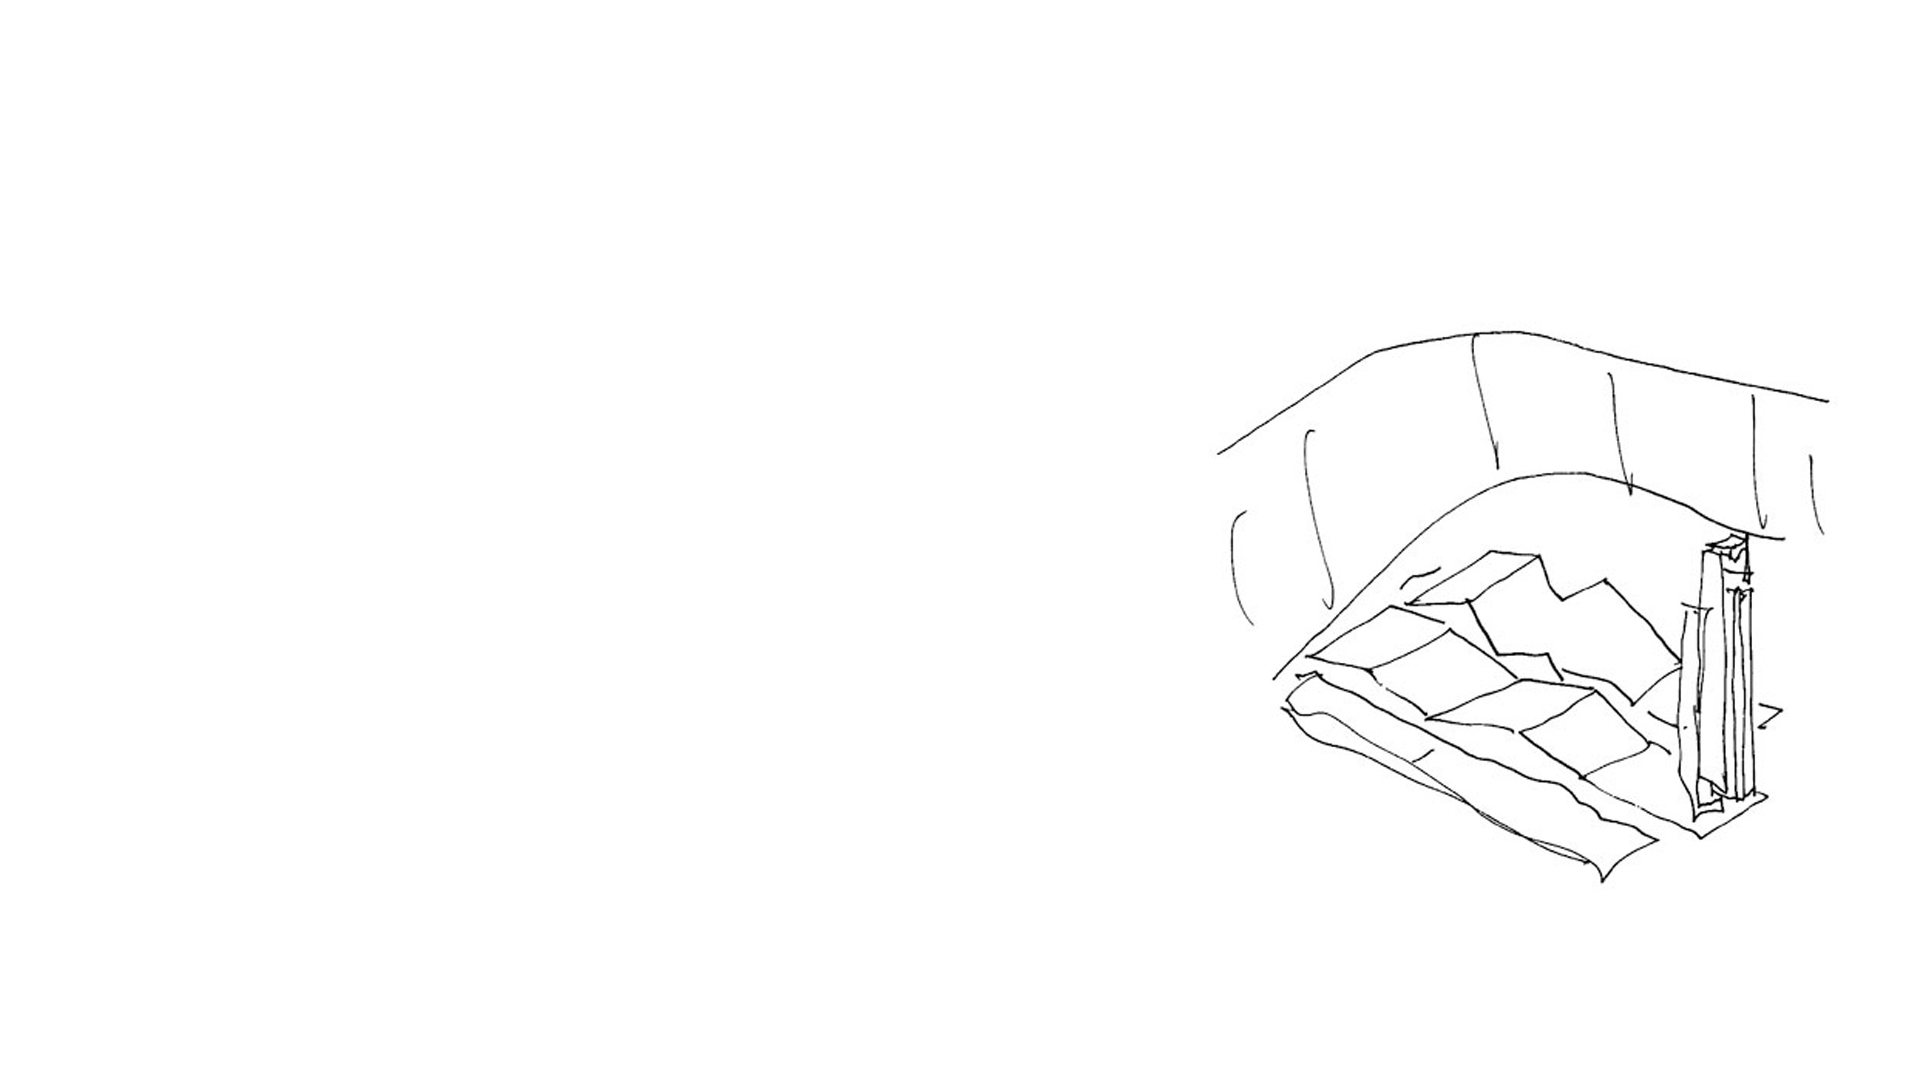 Keith Williams' concept massing sketch for Athlone Army Memorial, Athlone Castle Ireland